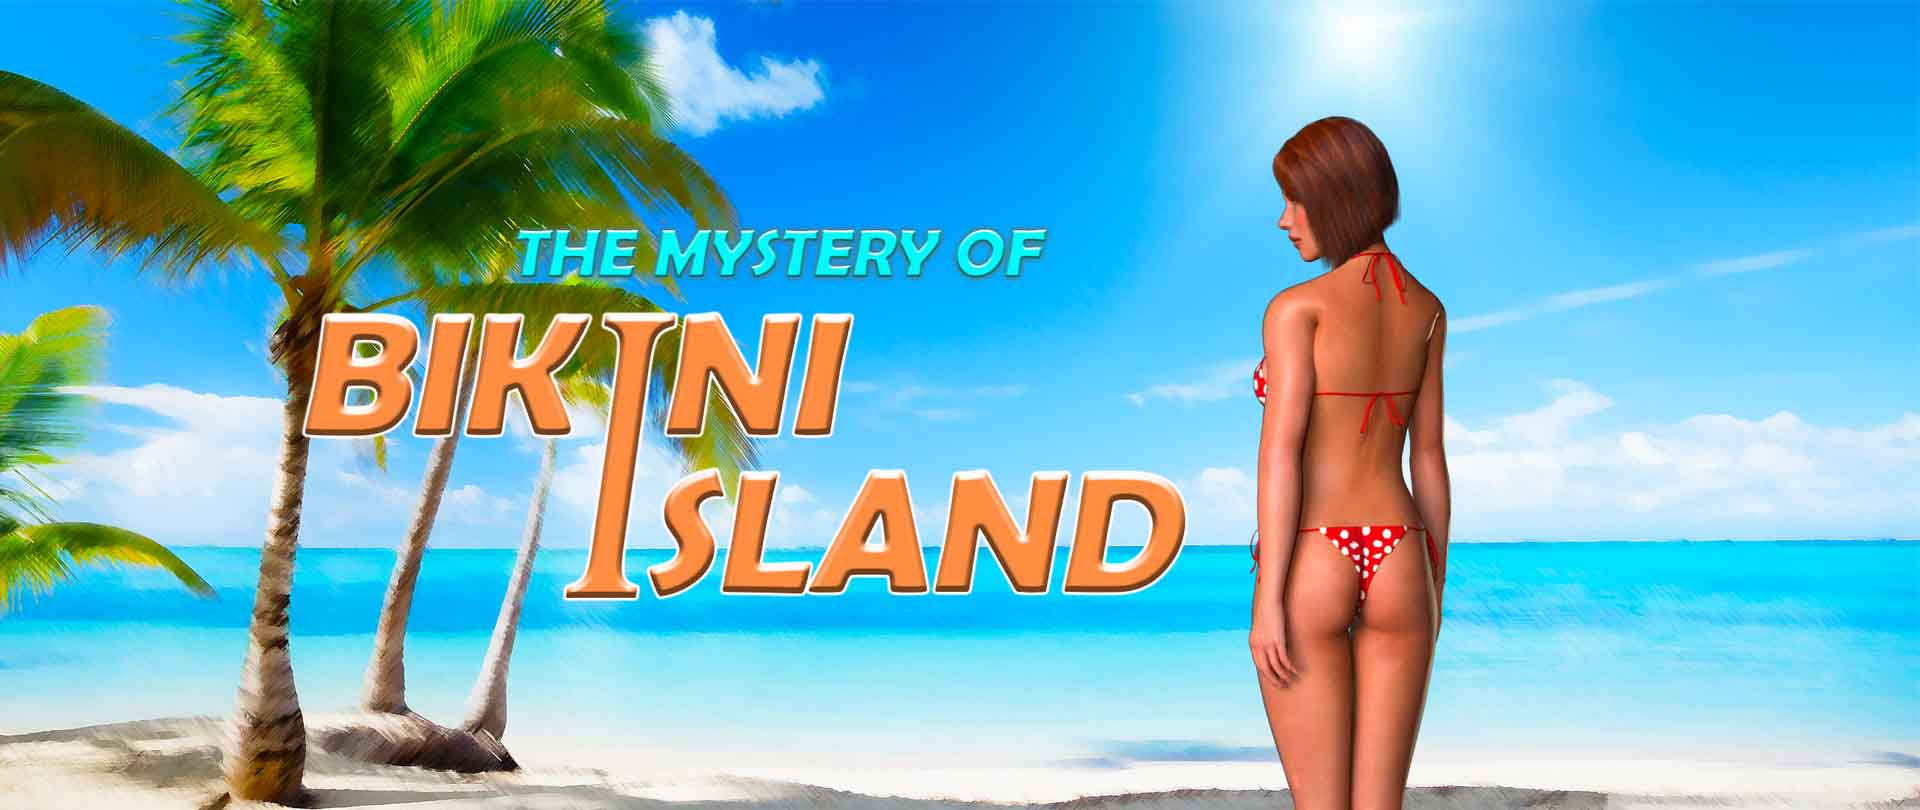 The-Mystery-of-Bikini-Island-